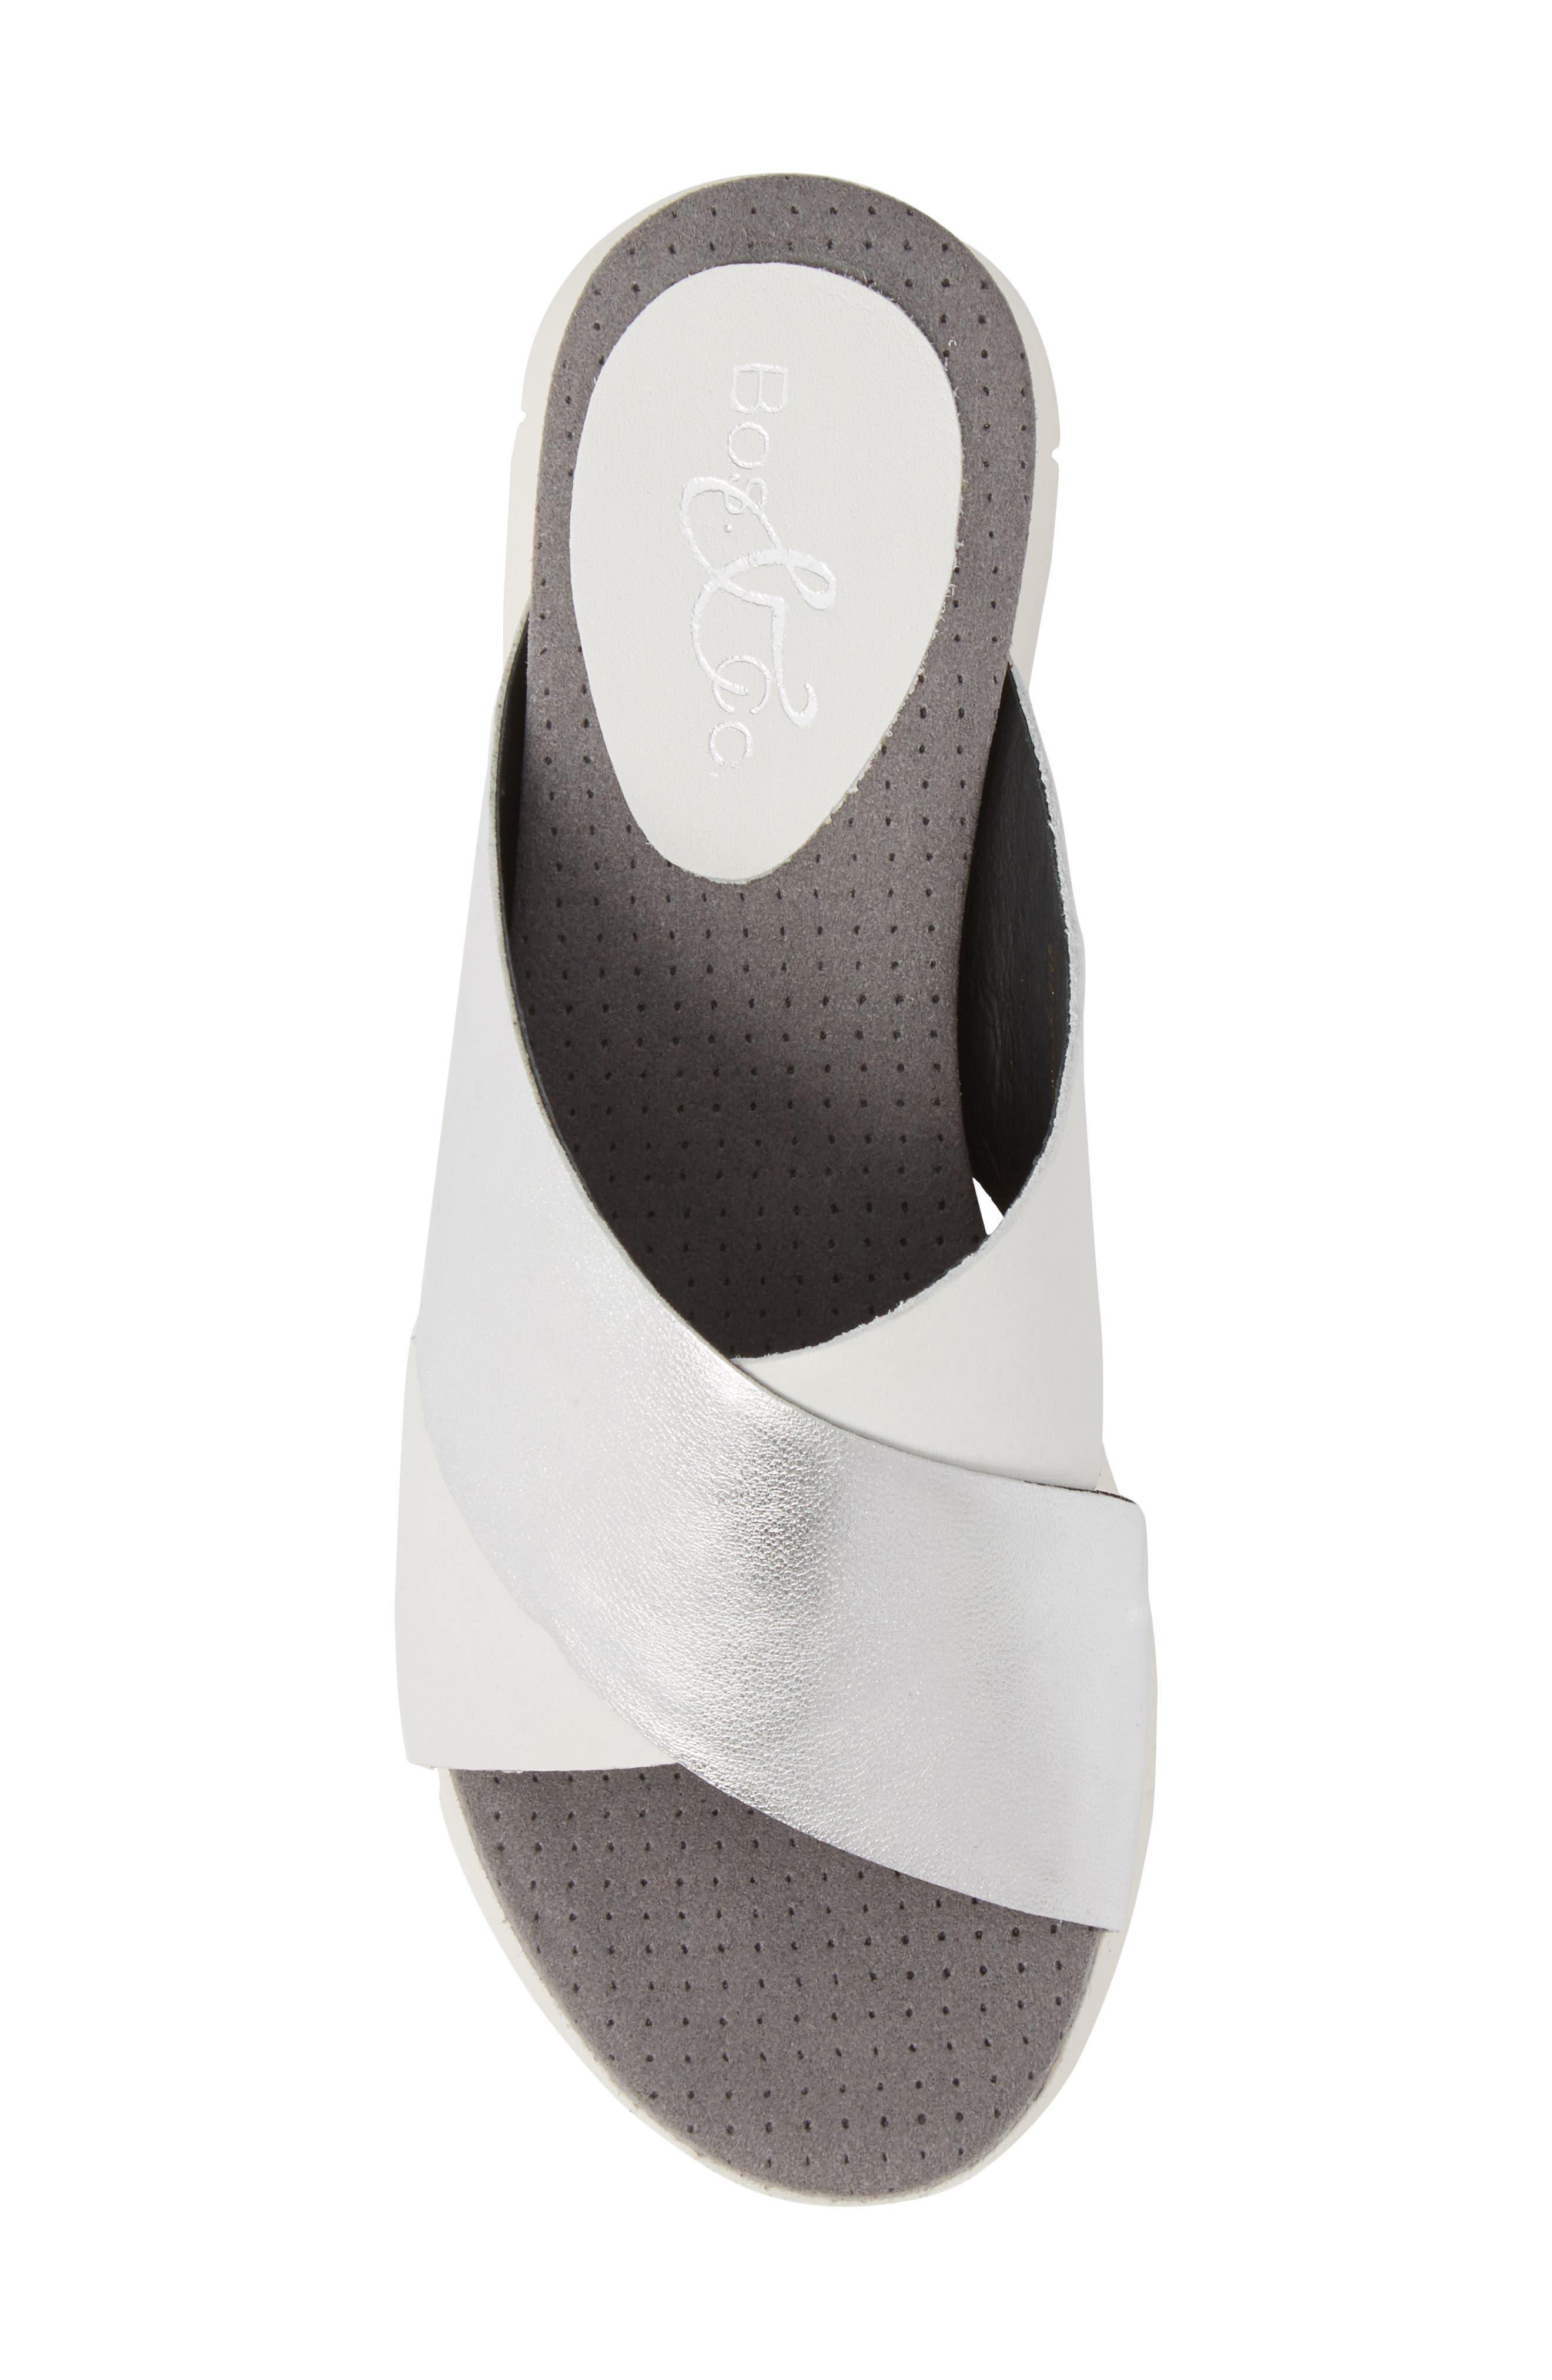 Piney Slide Sandal,                             Alternate thumbnail 5, color,                             White/ Silver Leather